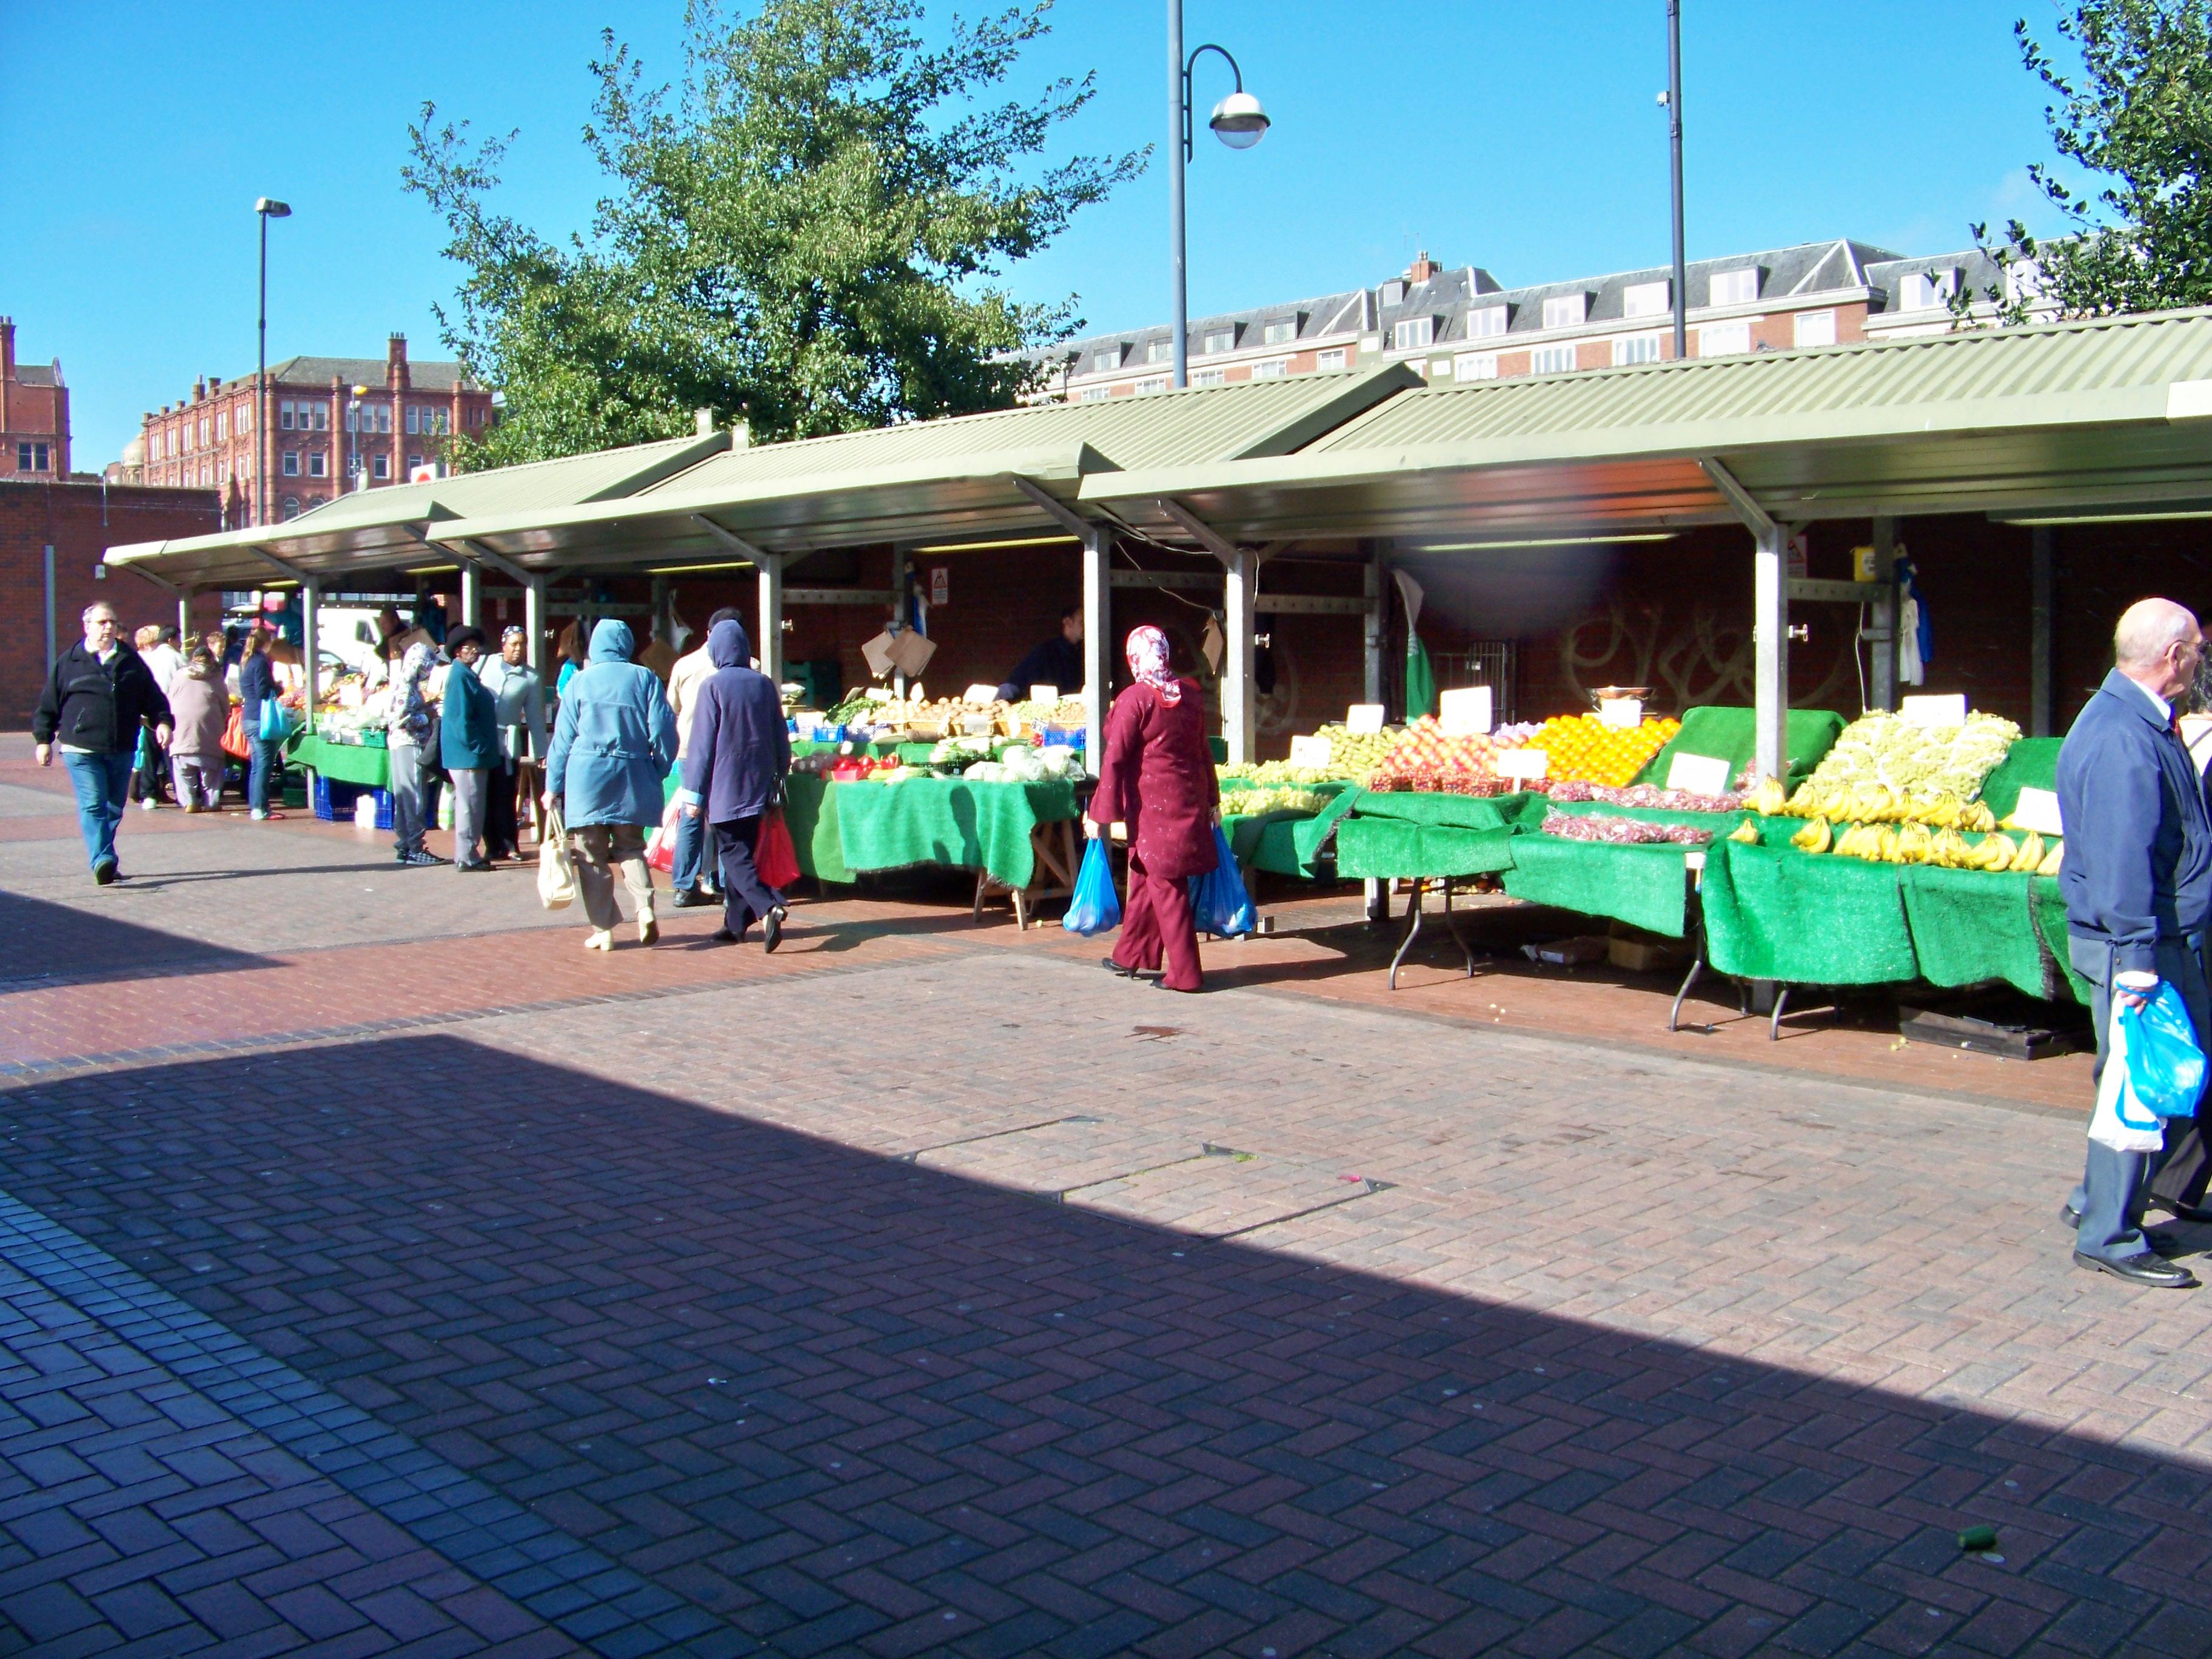 File:Outdoor market, Kirkgate Markets, Leeds.jpg ...